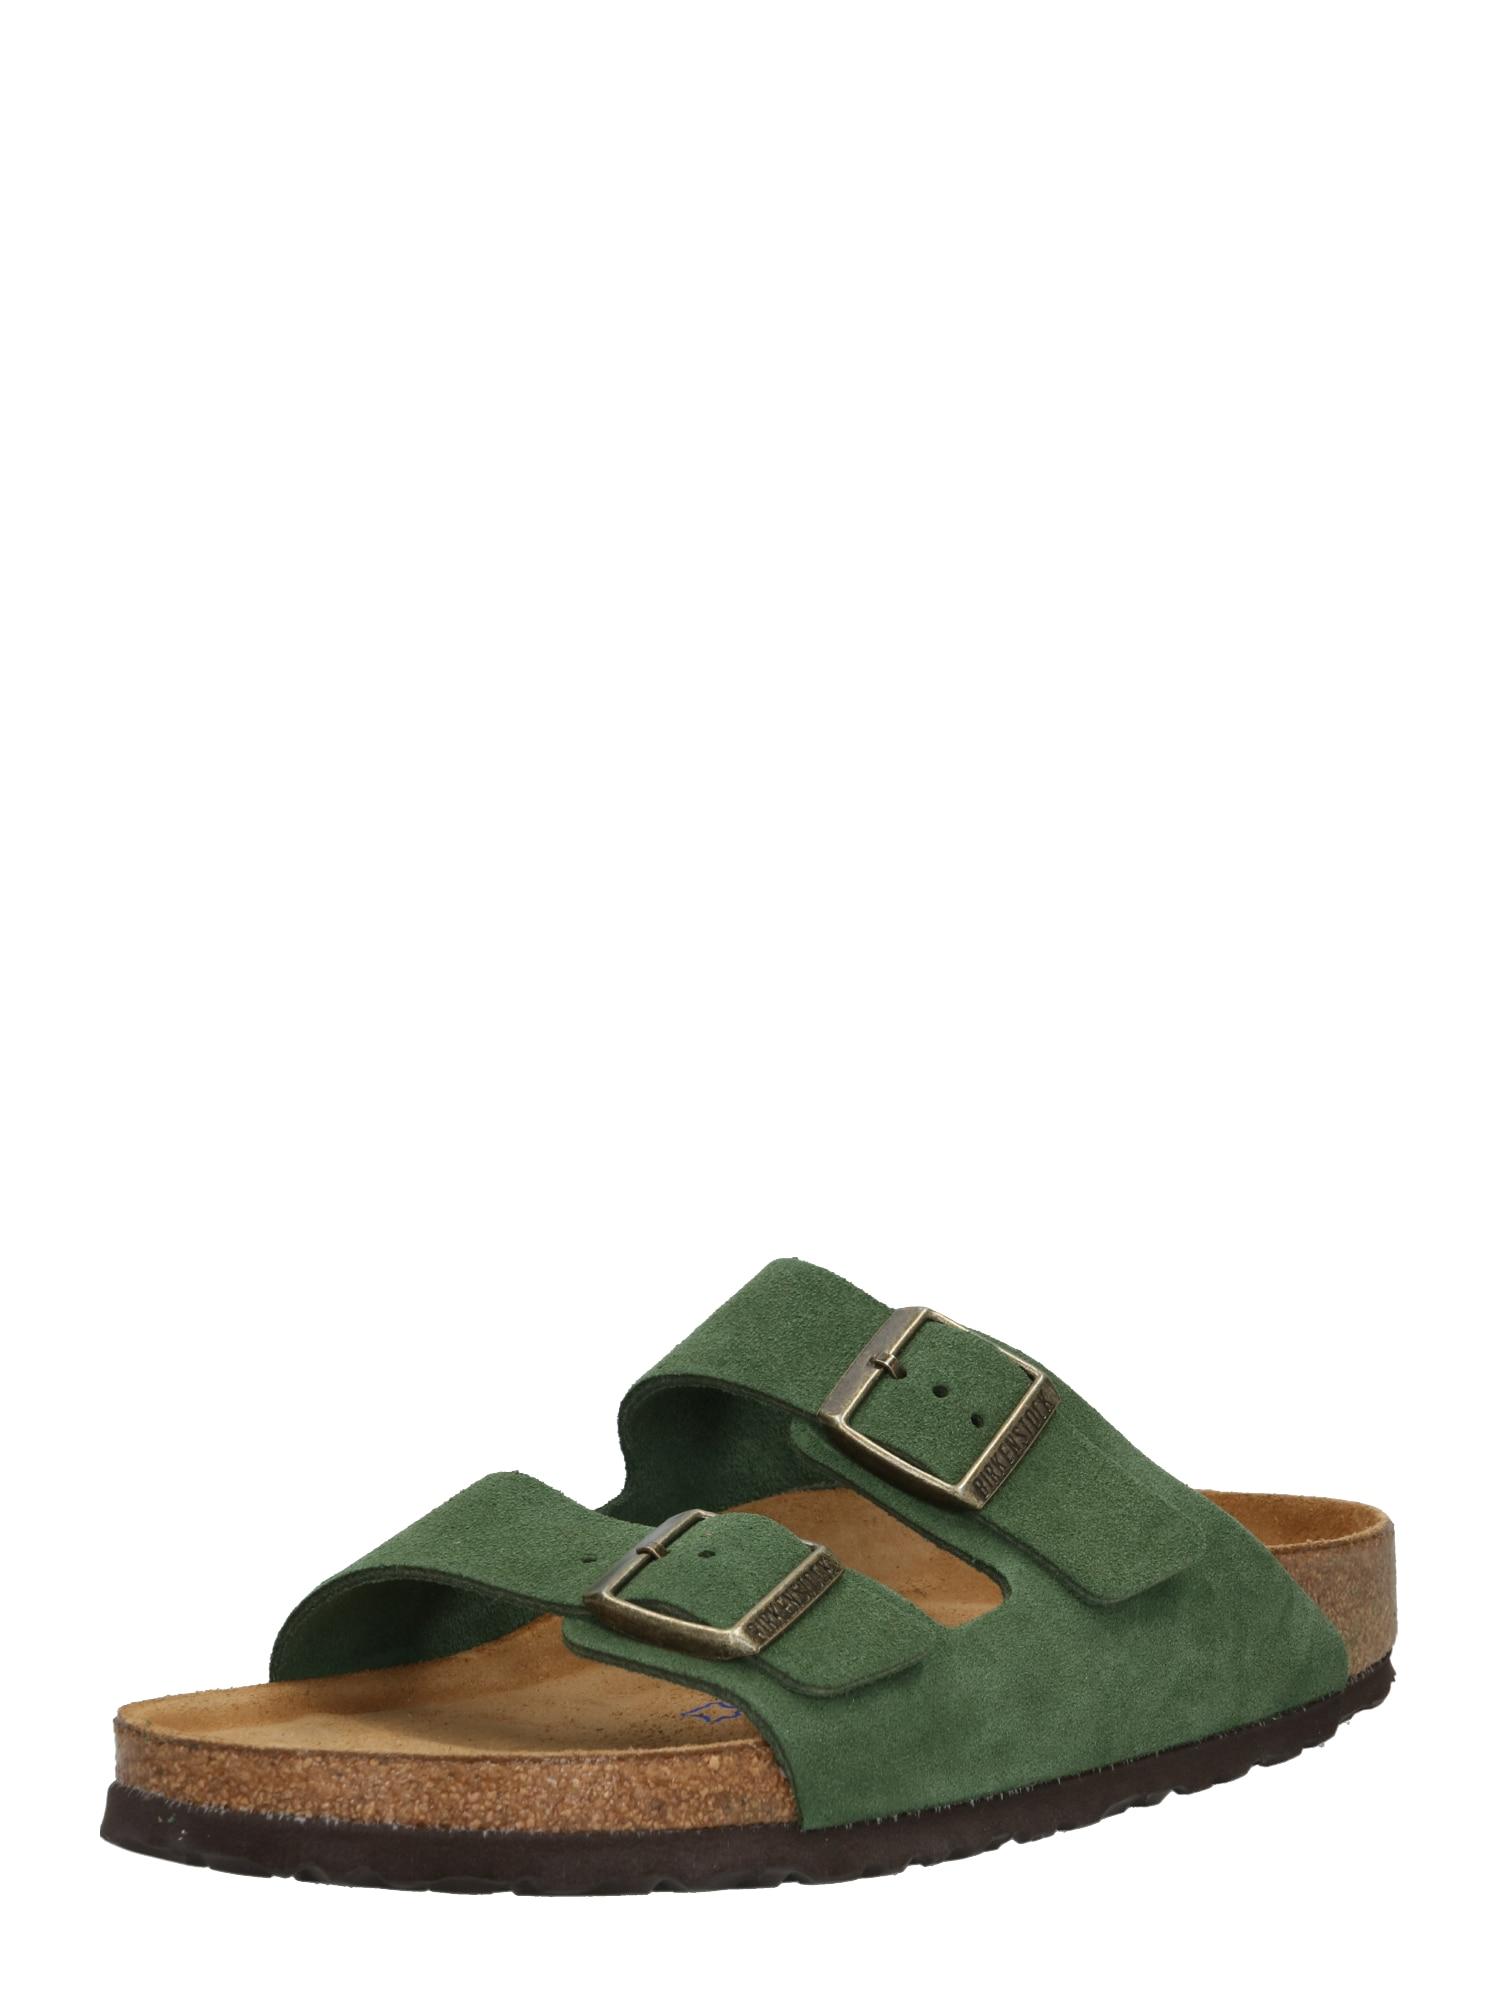 Pantofle Arizona Suede khaki BIRKENSTOCK